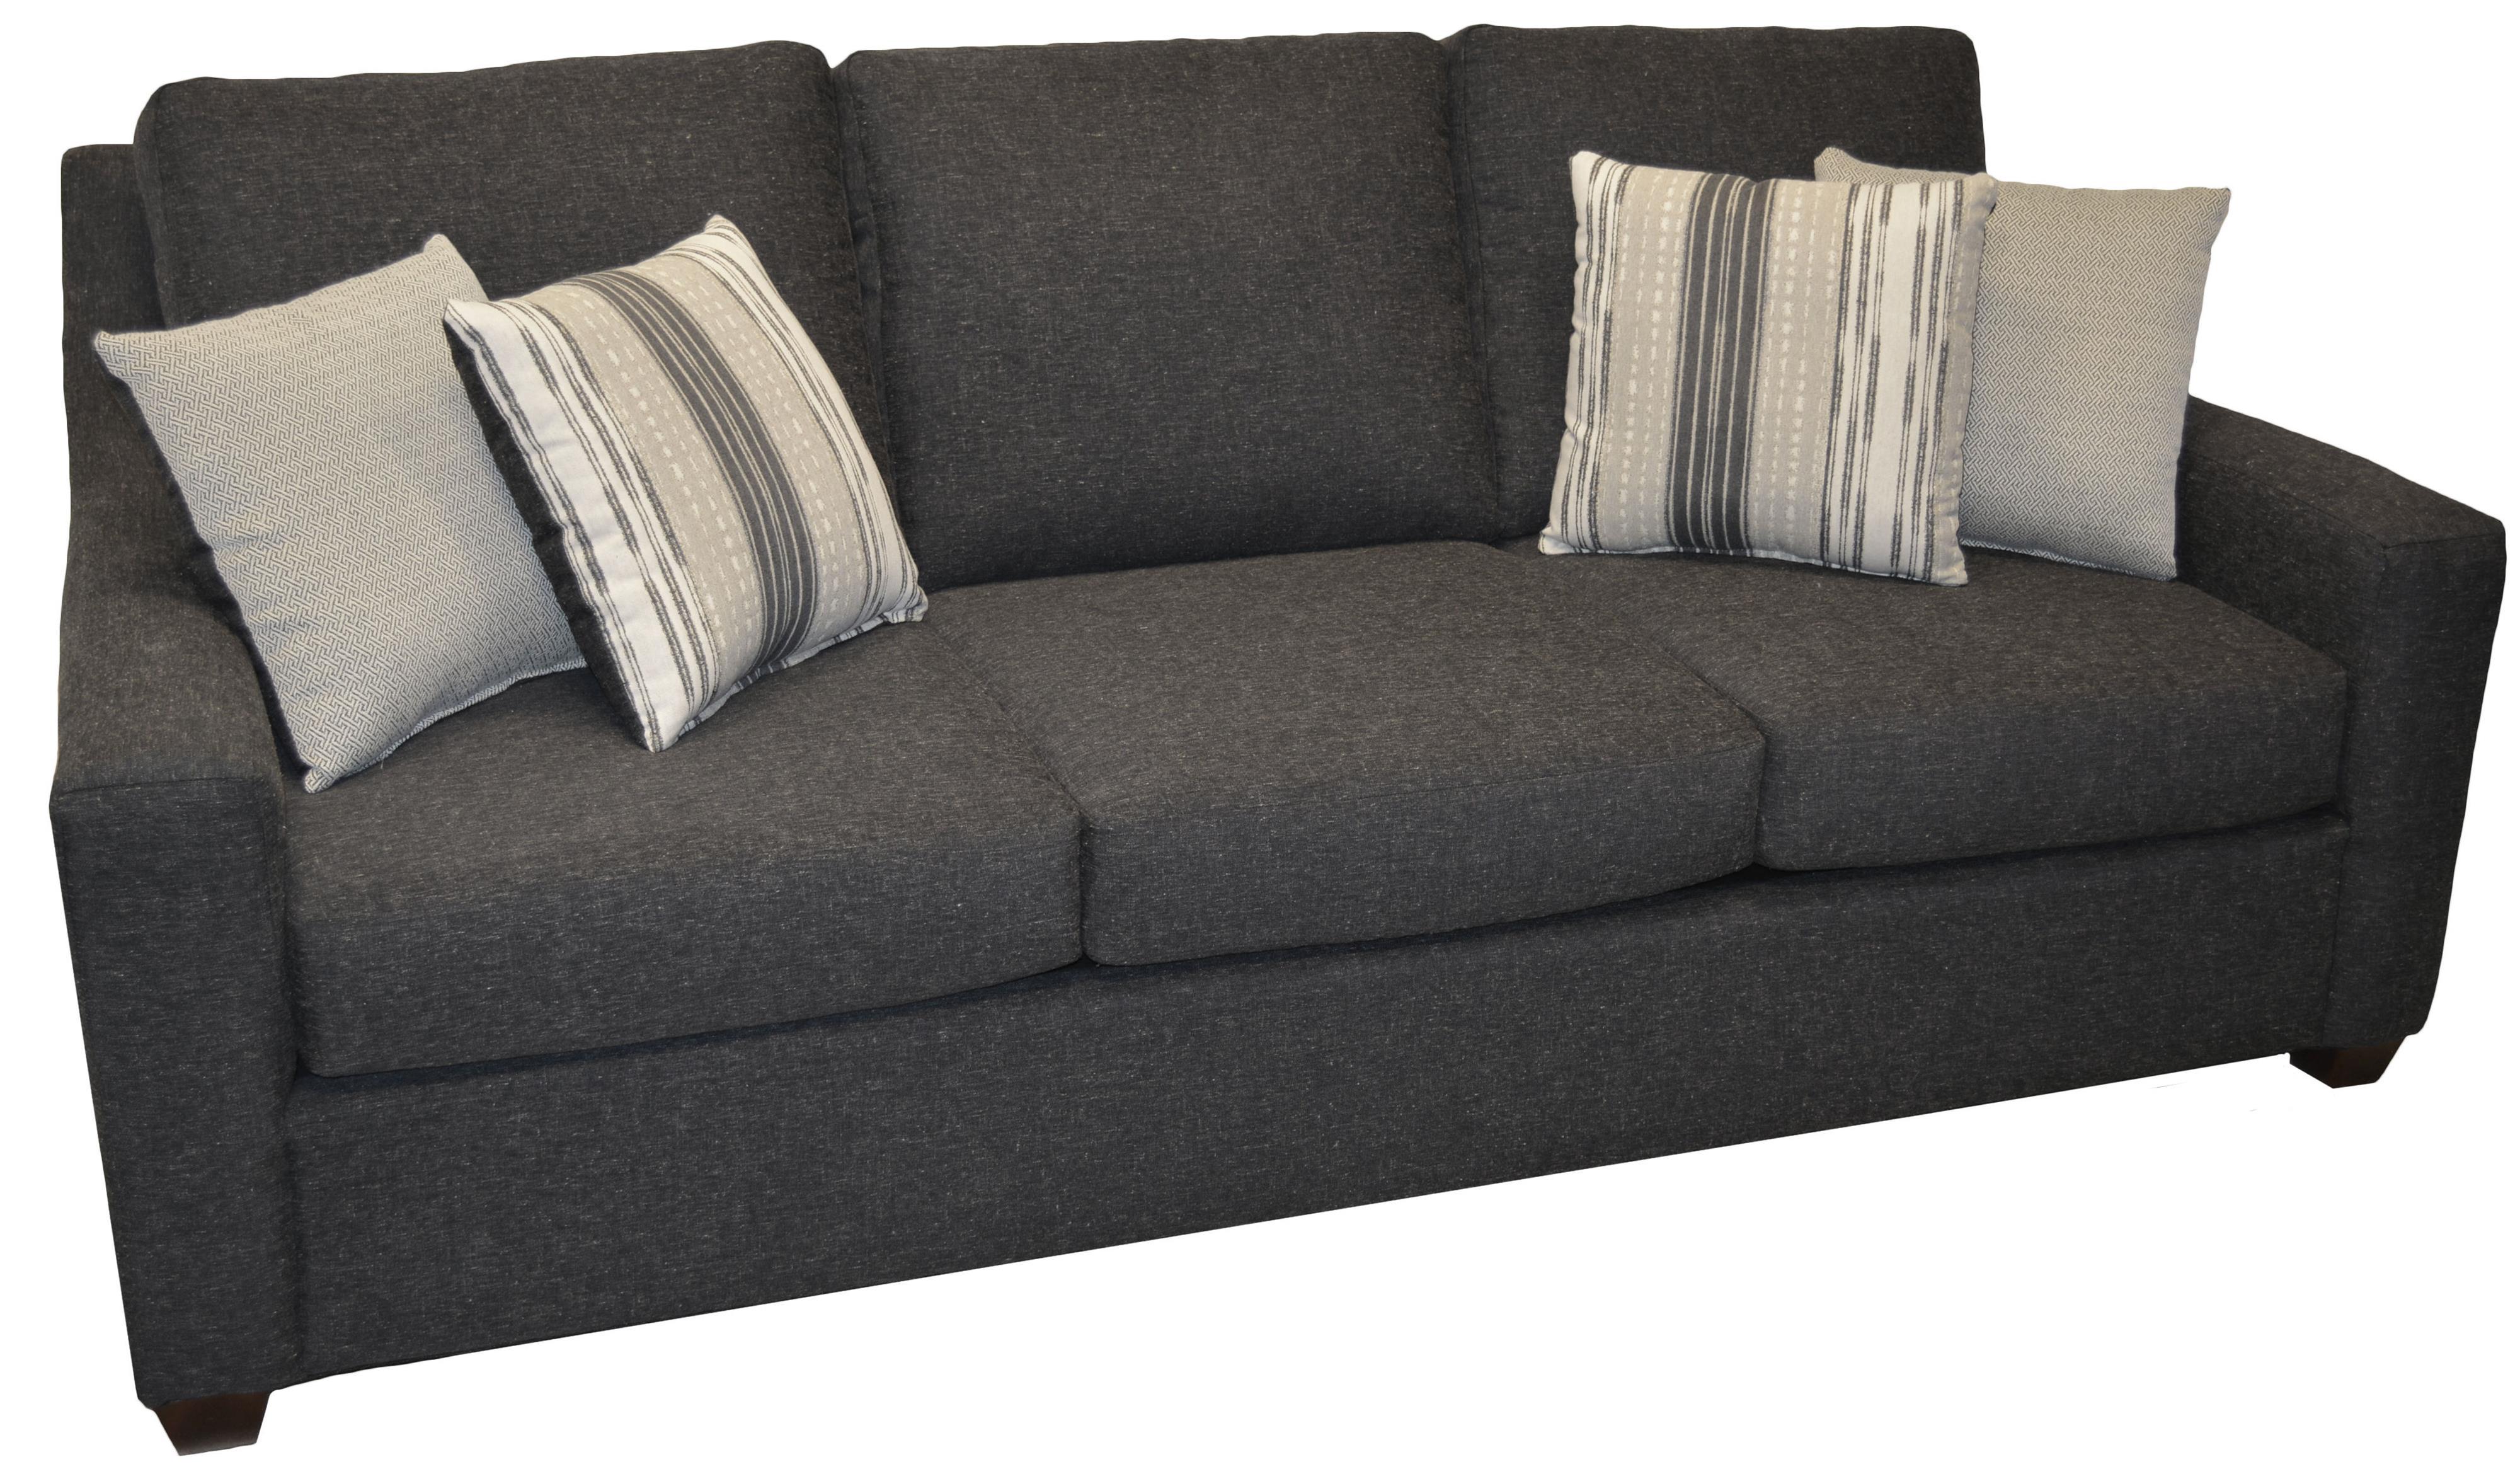 LaCrosse 423 Queen Sleeper Sofa - Item Number: 423605-1073_09